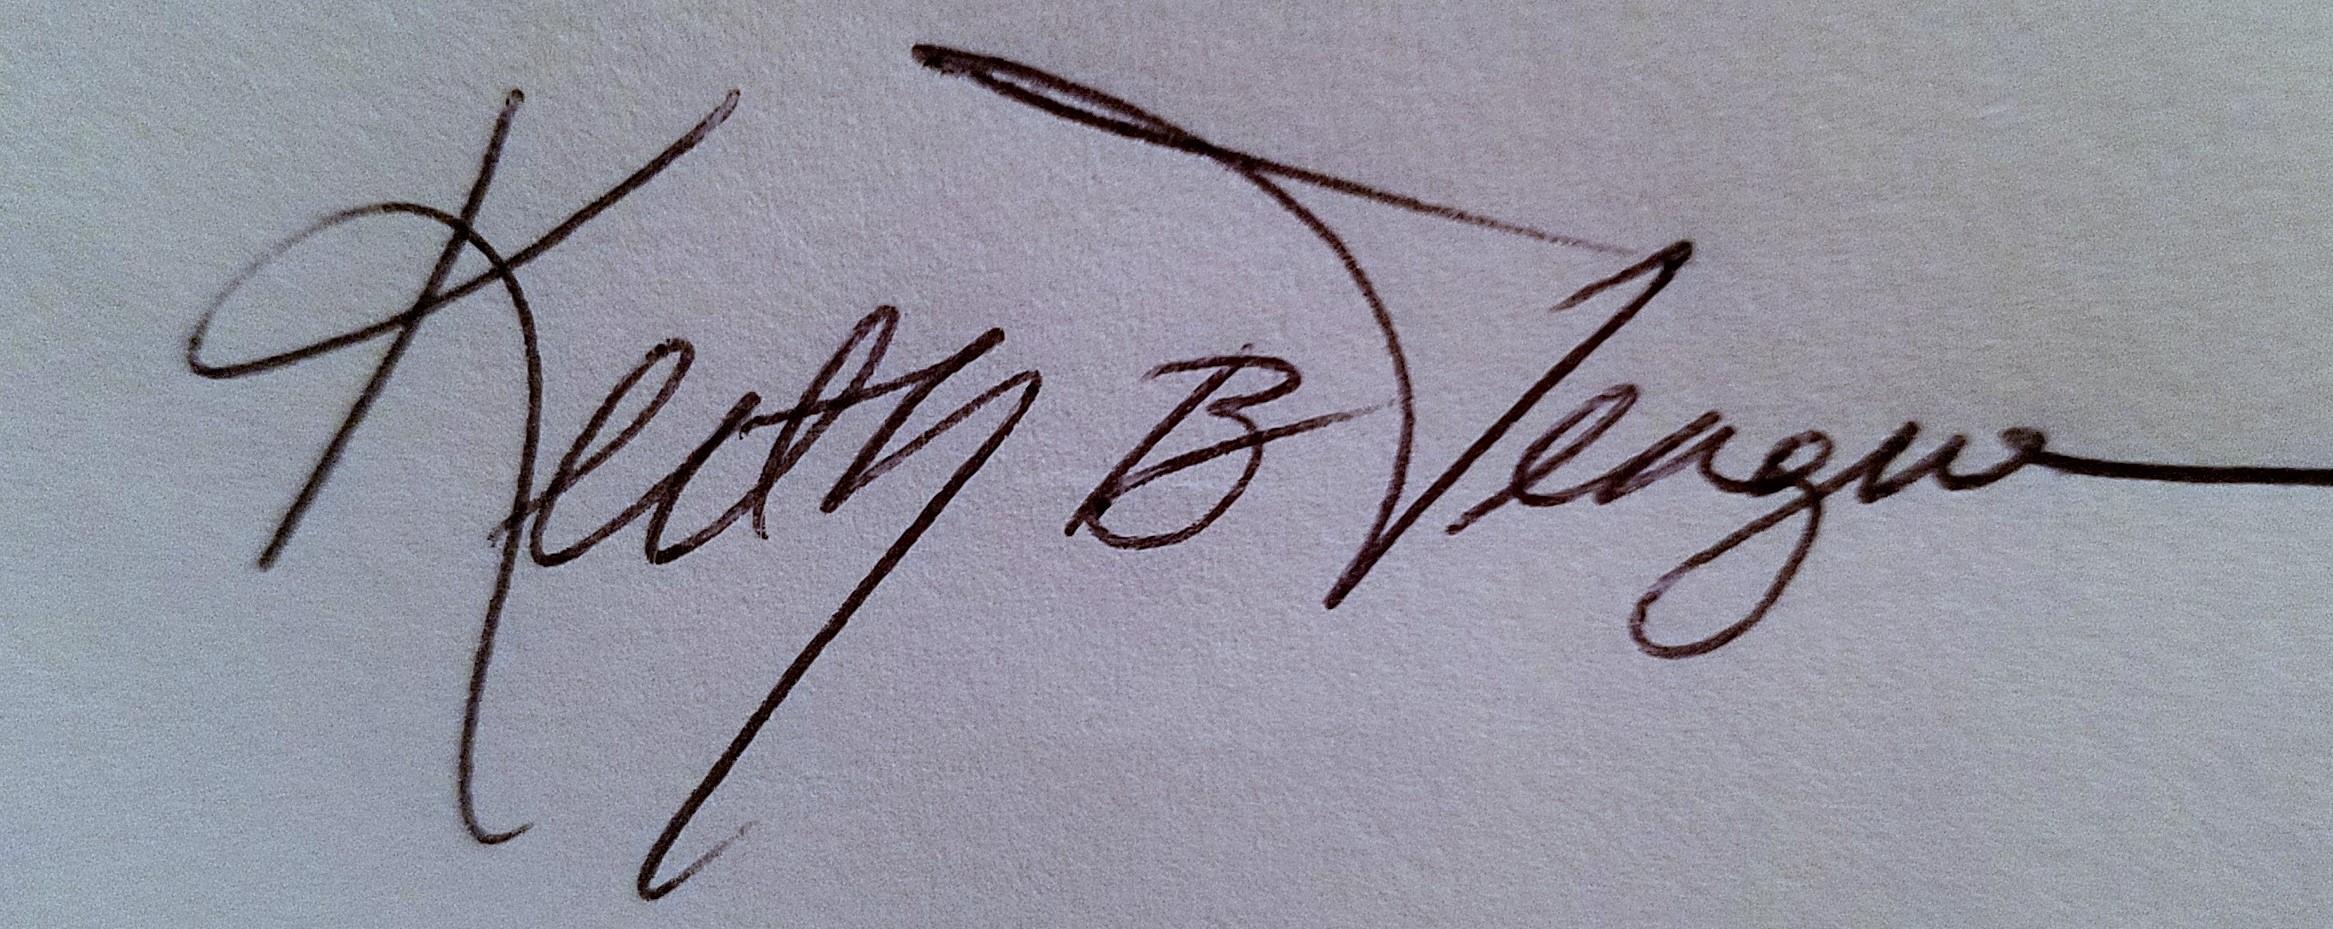 Keith Teague's Signature